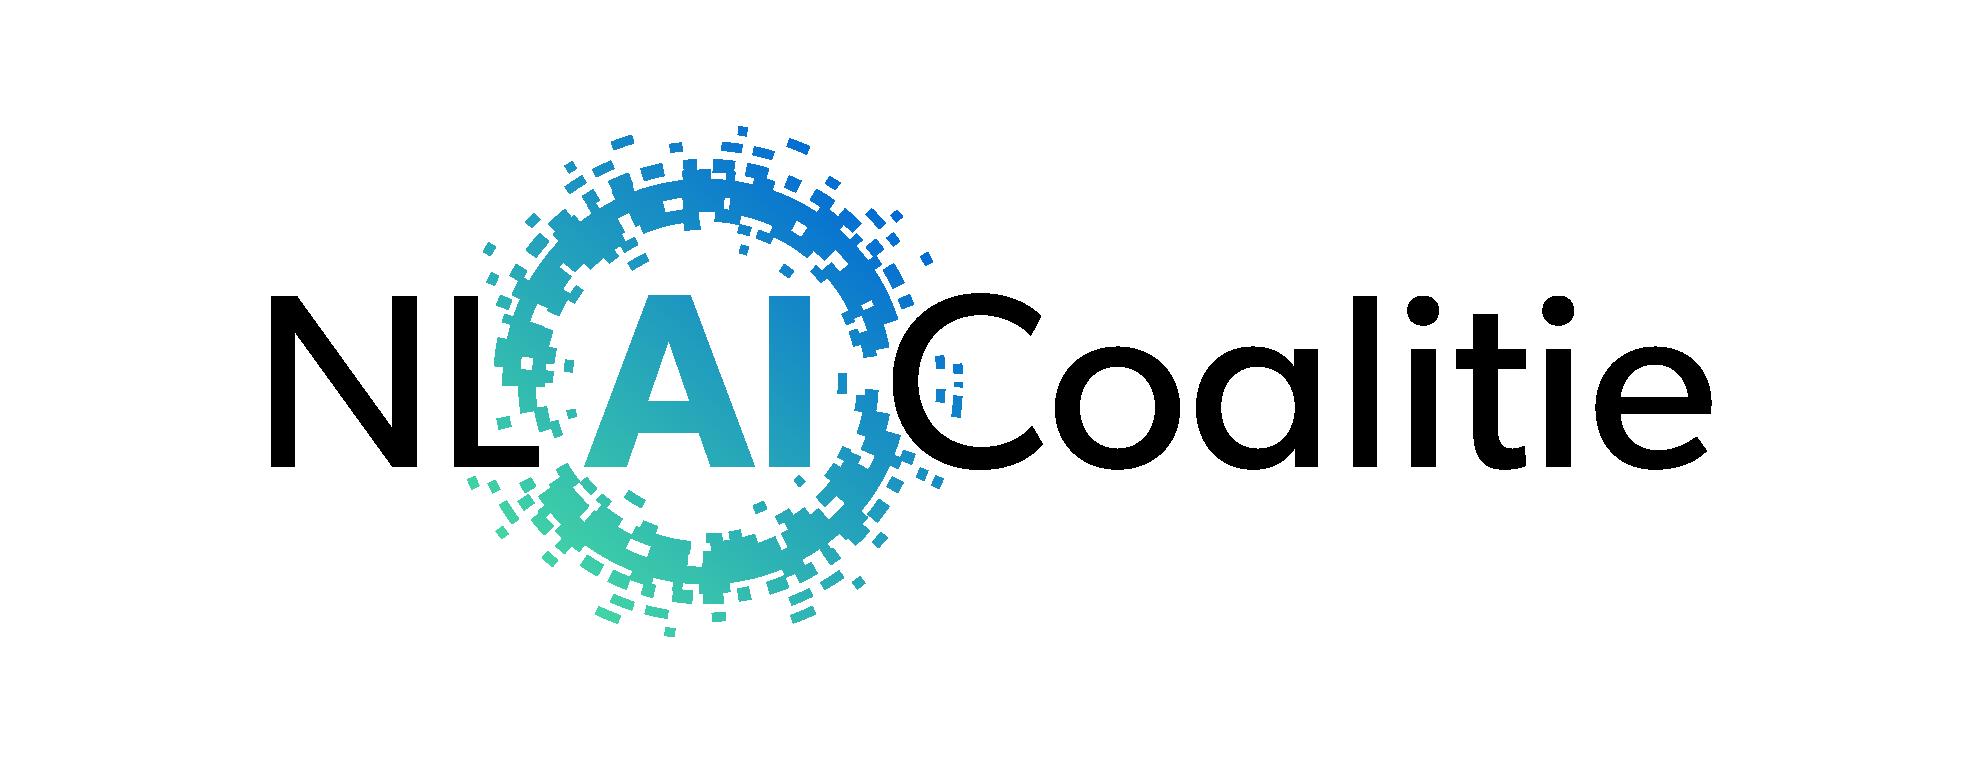 NL AI Coalitie logo